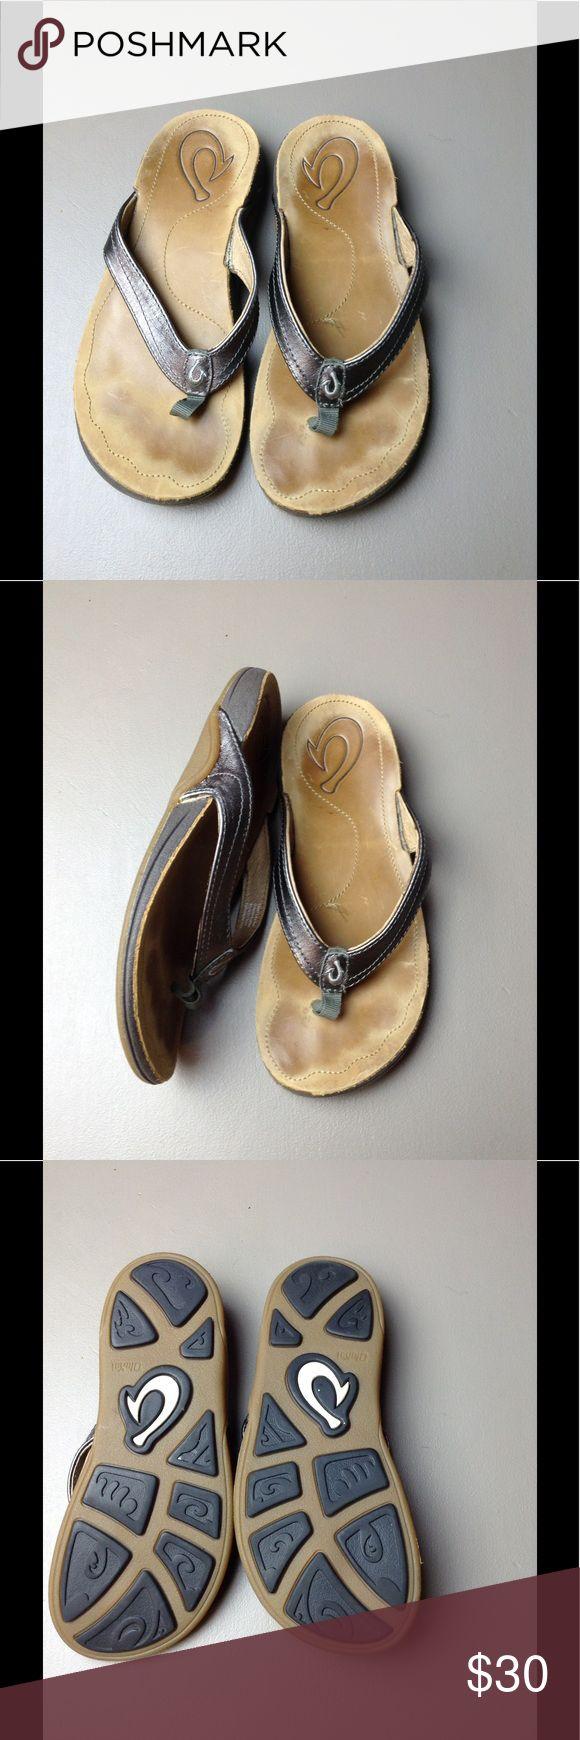 Olukai sandals Olukai sandals OluKai Shoes Sandals